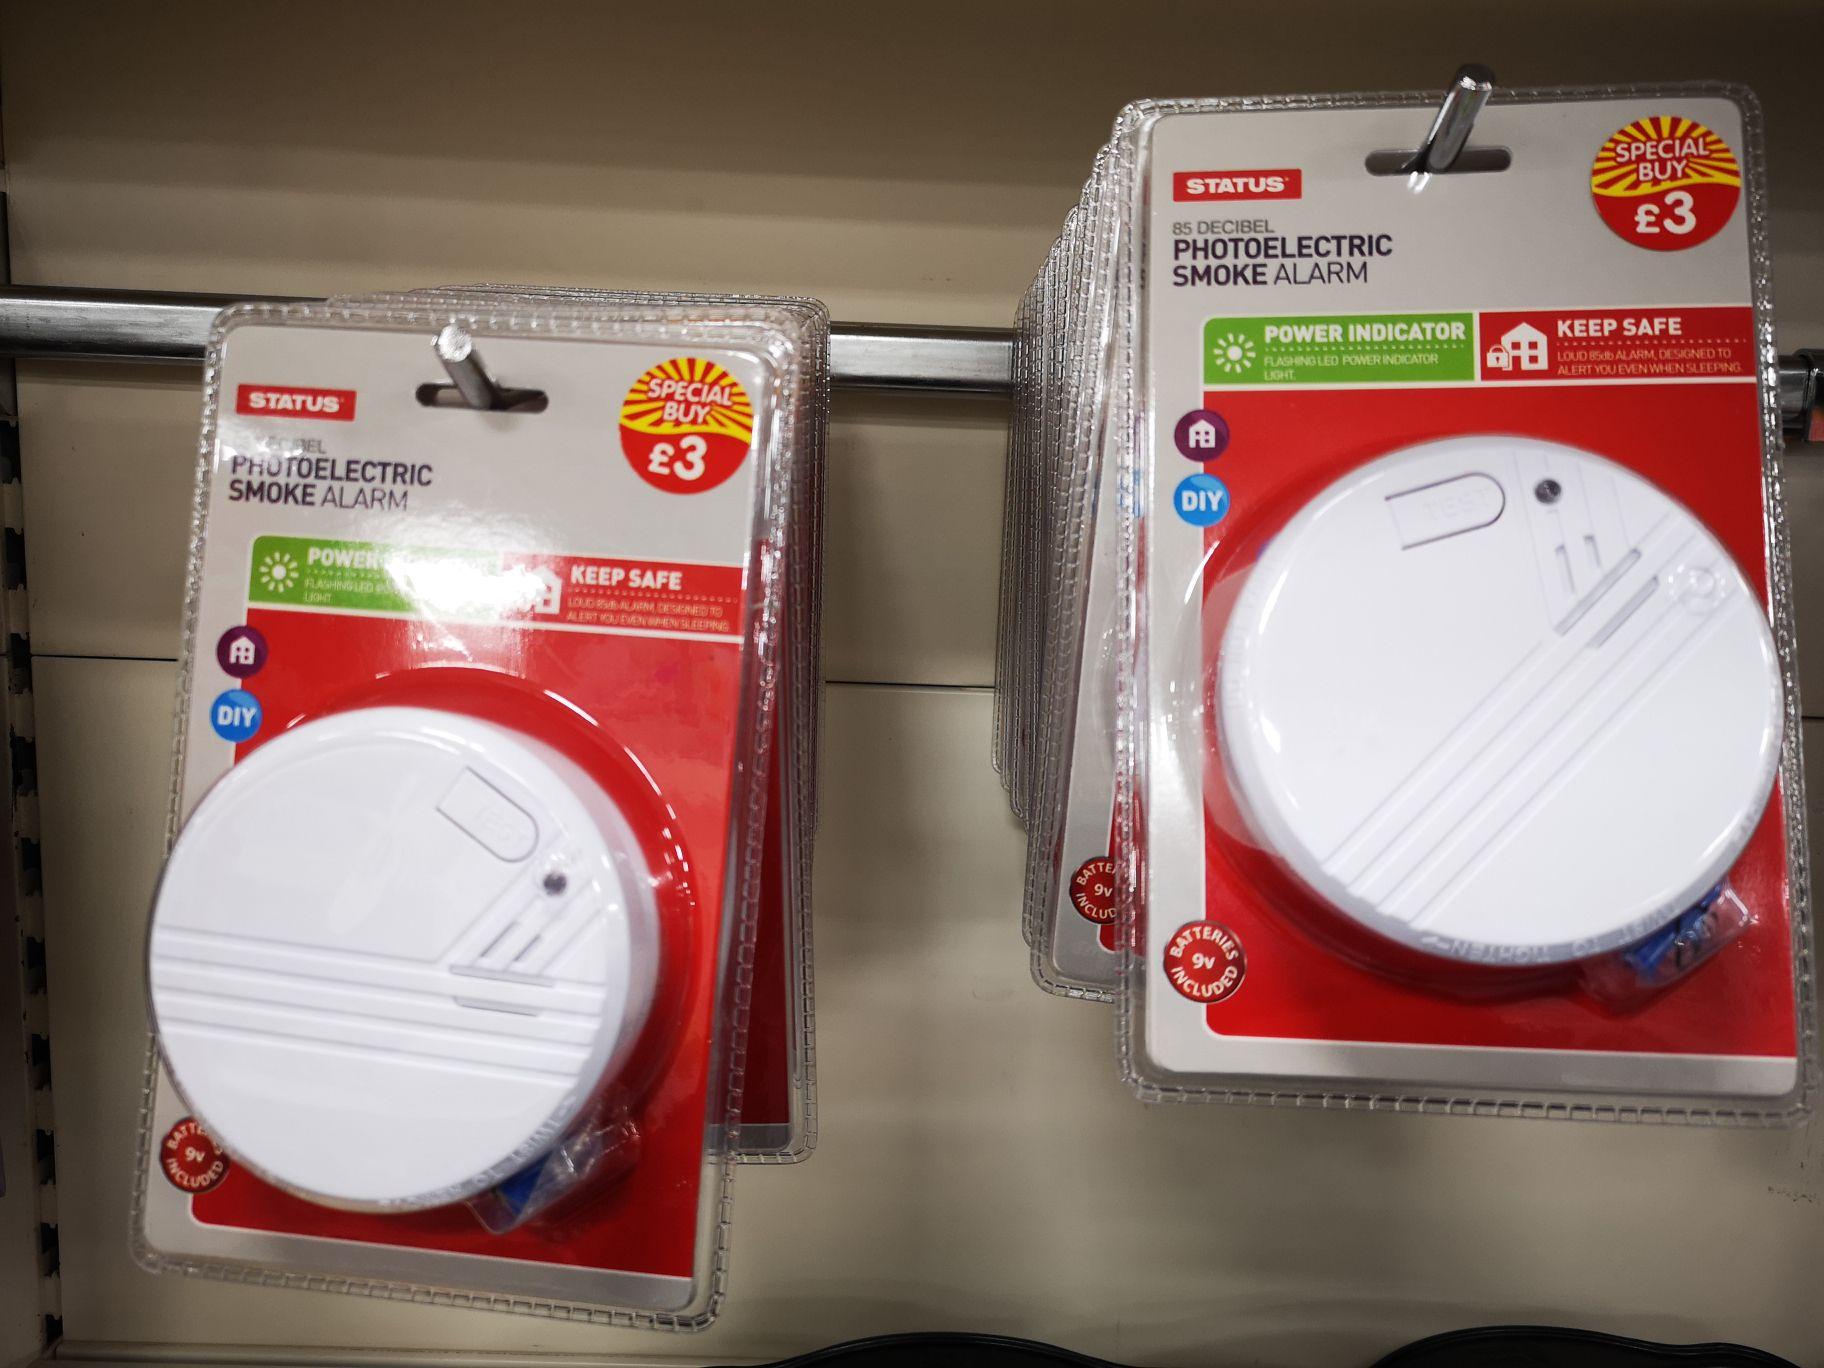 Status photoelectric smoke alarm £3 @ B&M